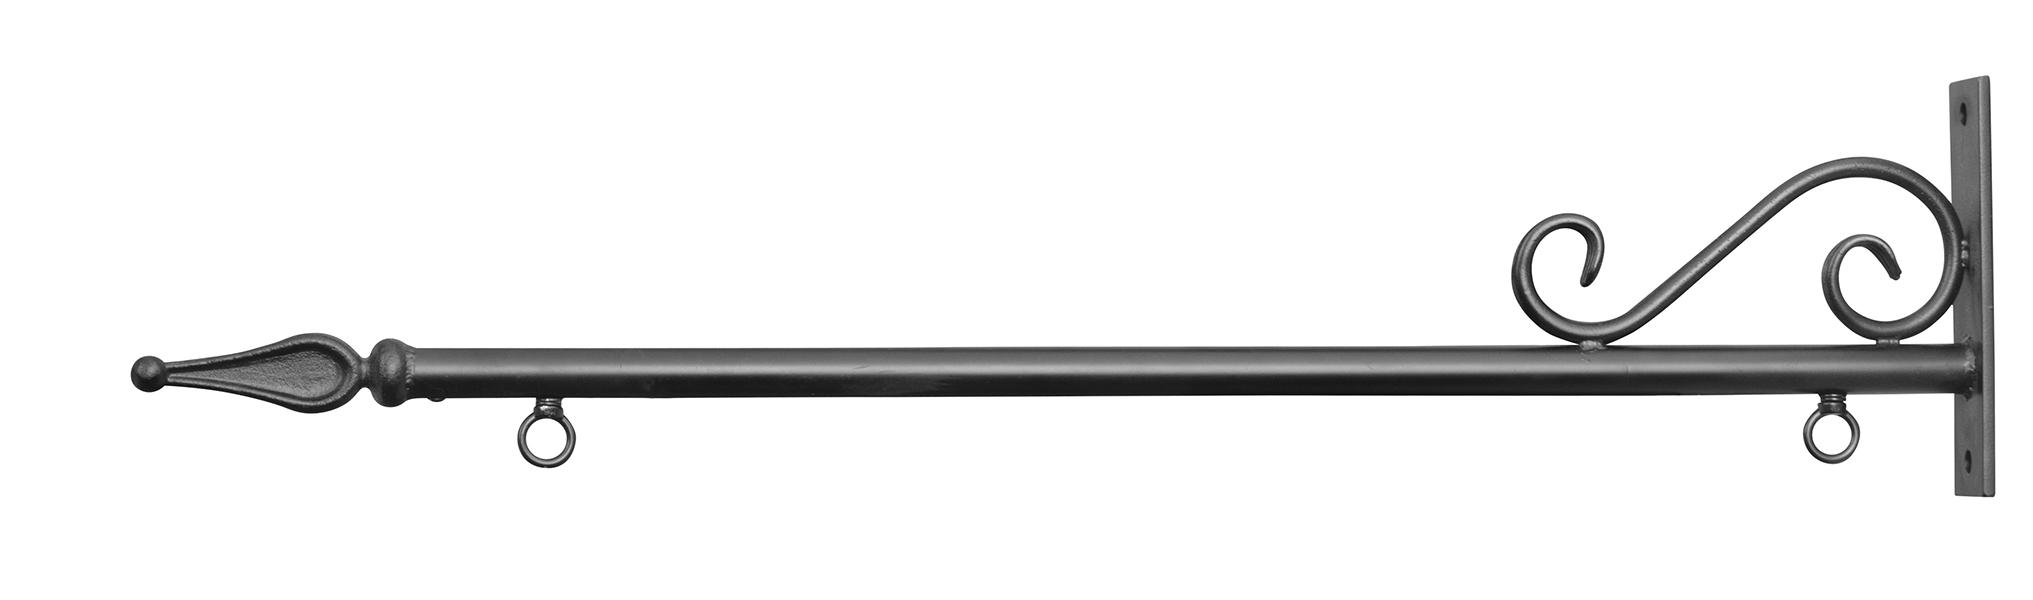 FLB-004